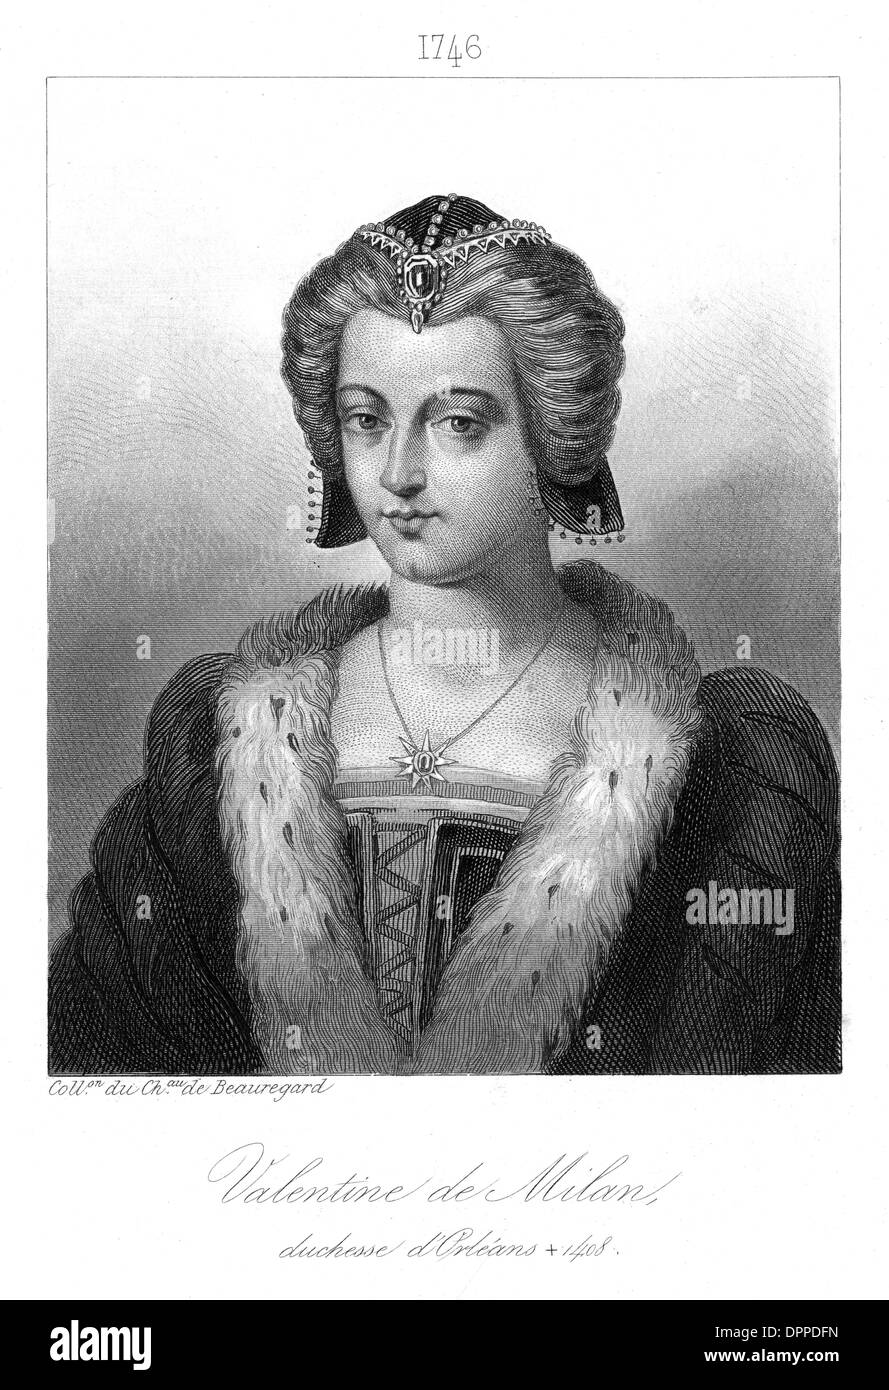 VALENTINE D'ORLEANS - Stock Image